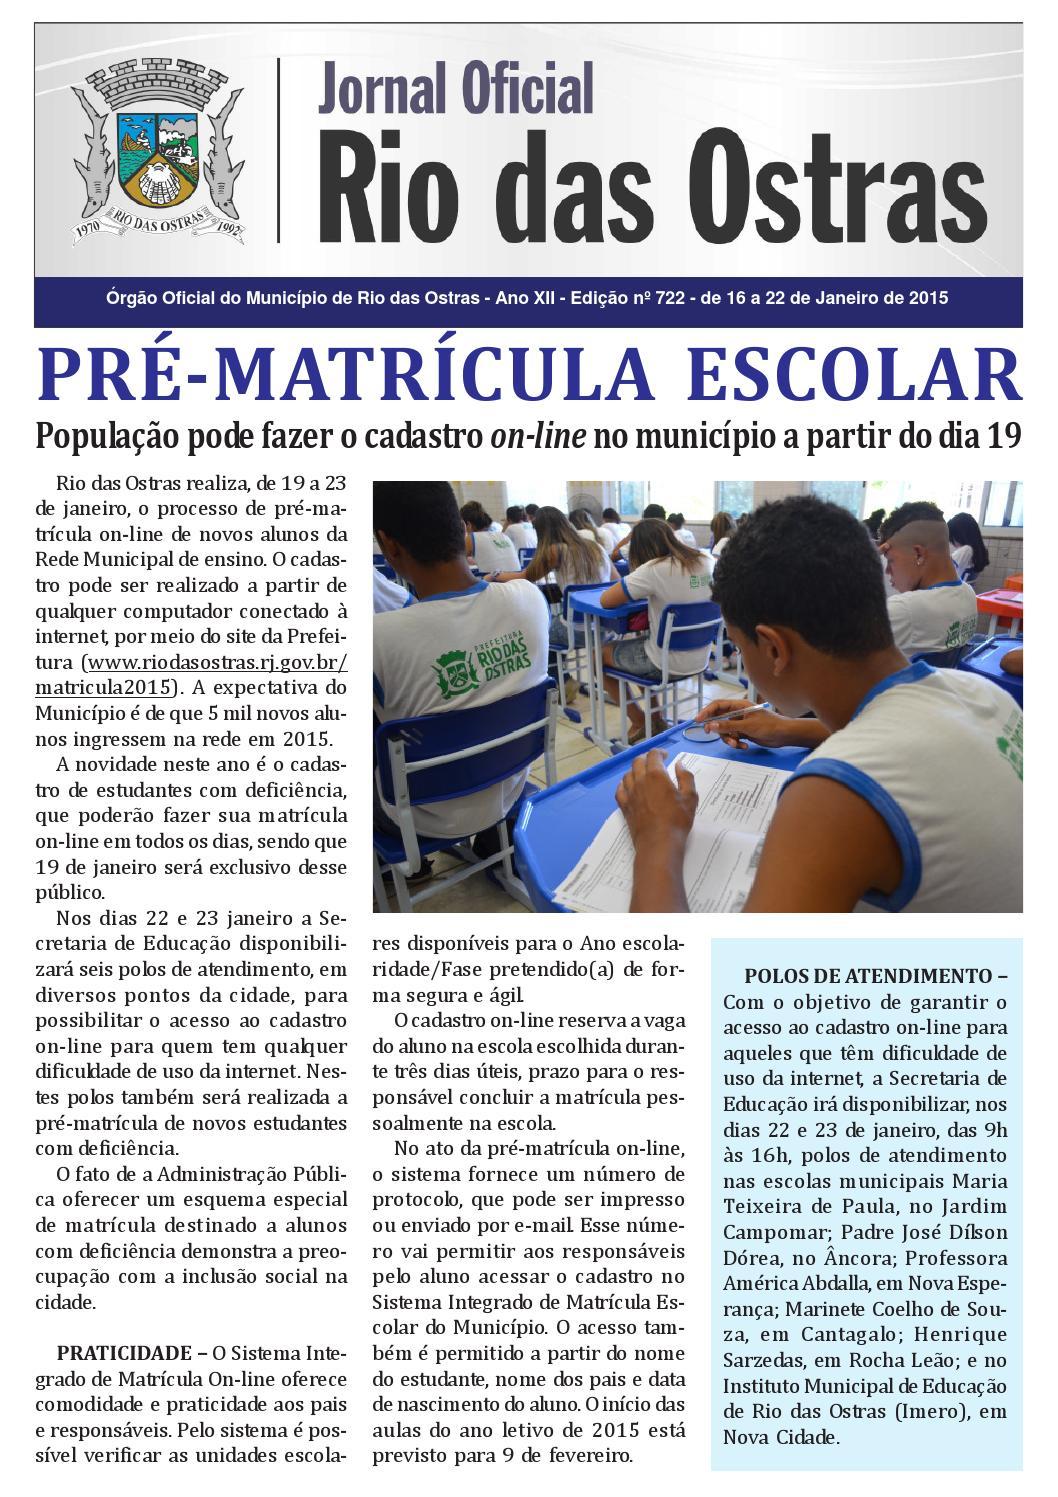 Armario Ingles Wordreference ~ ISSUU Ediç u00e3o n u00ba 722 by Rio Das Ostras Jornal